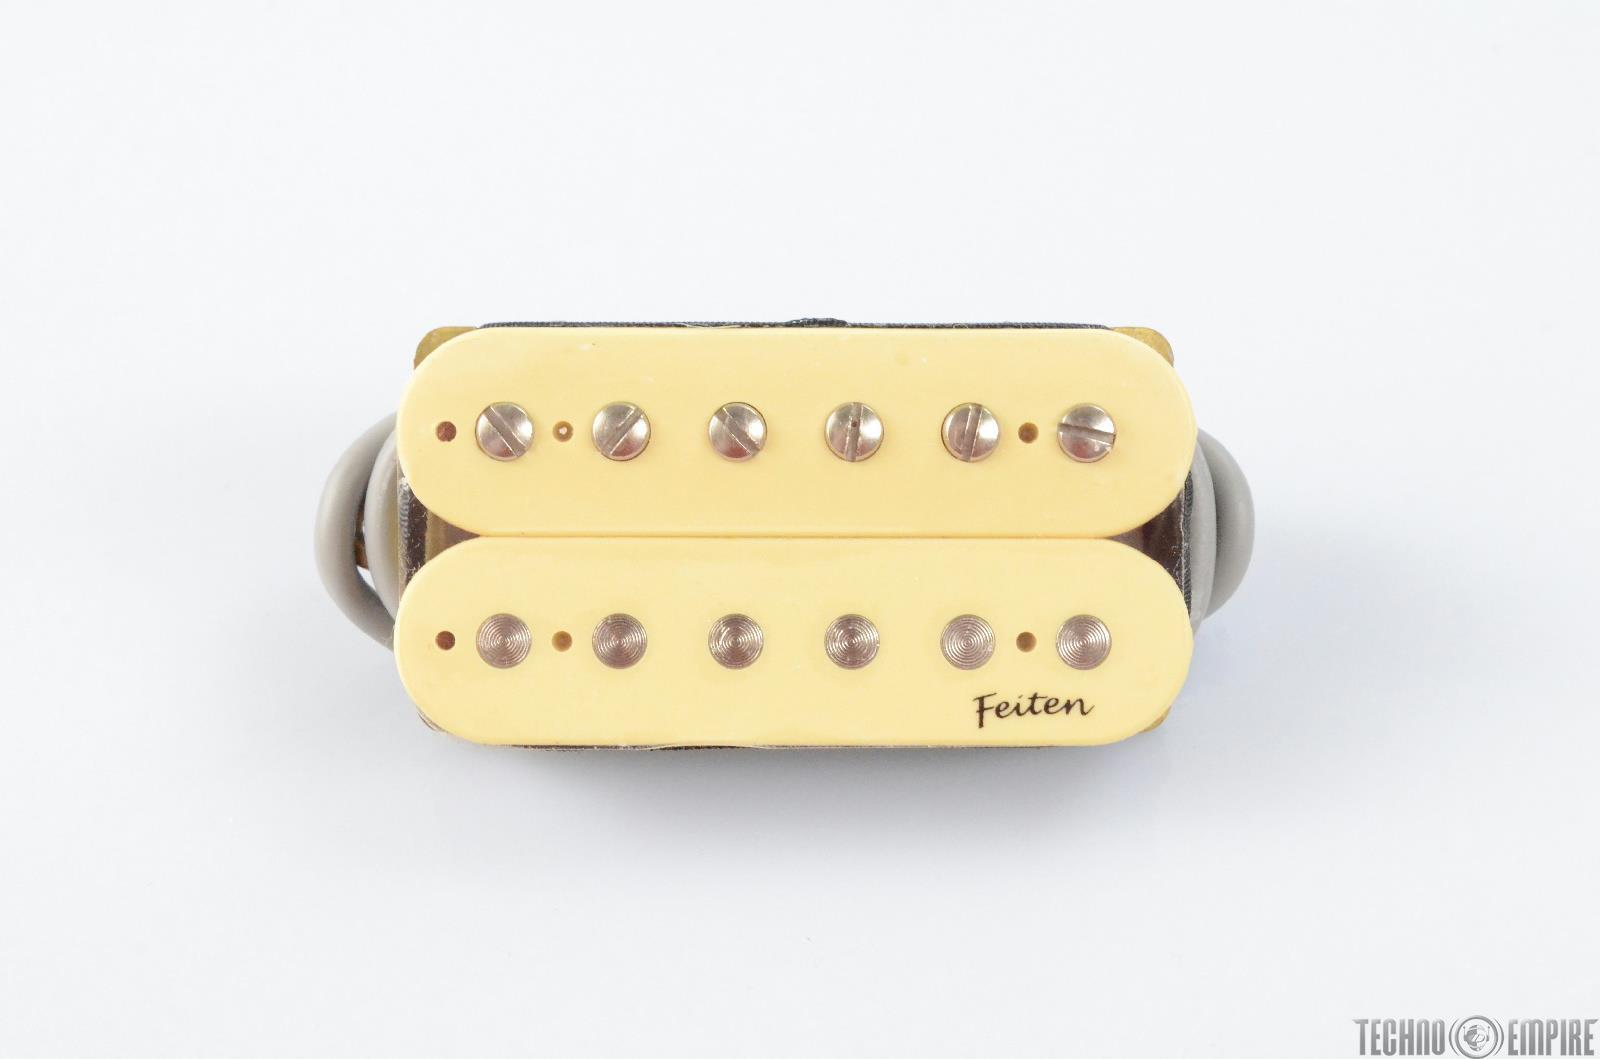 Buzz Feiten G&B G-109 Open Humbucker Cream Electric Guitar Neck Pickup #28589